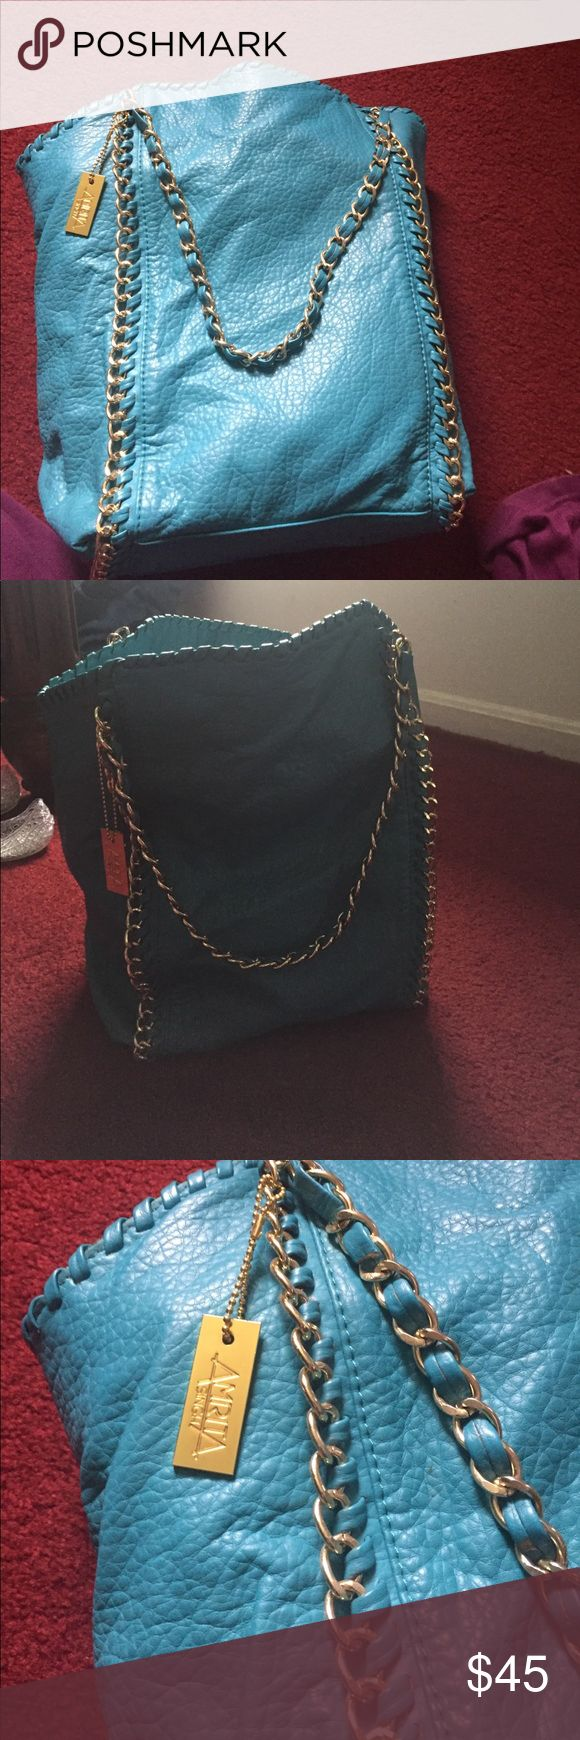 Amrita Singh chain bag Amrita Singh chain bag- great condition. Pen mark inside. Amrita Singh Bags Shoulder Bags